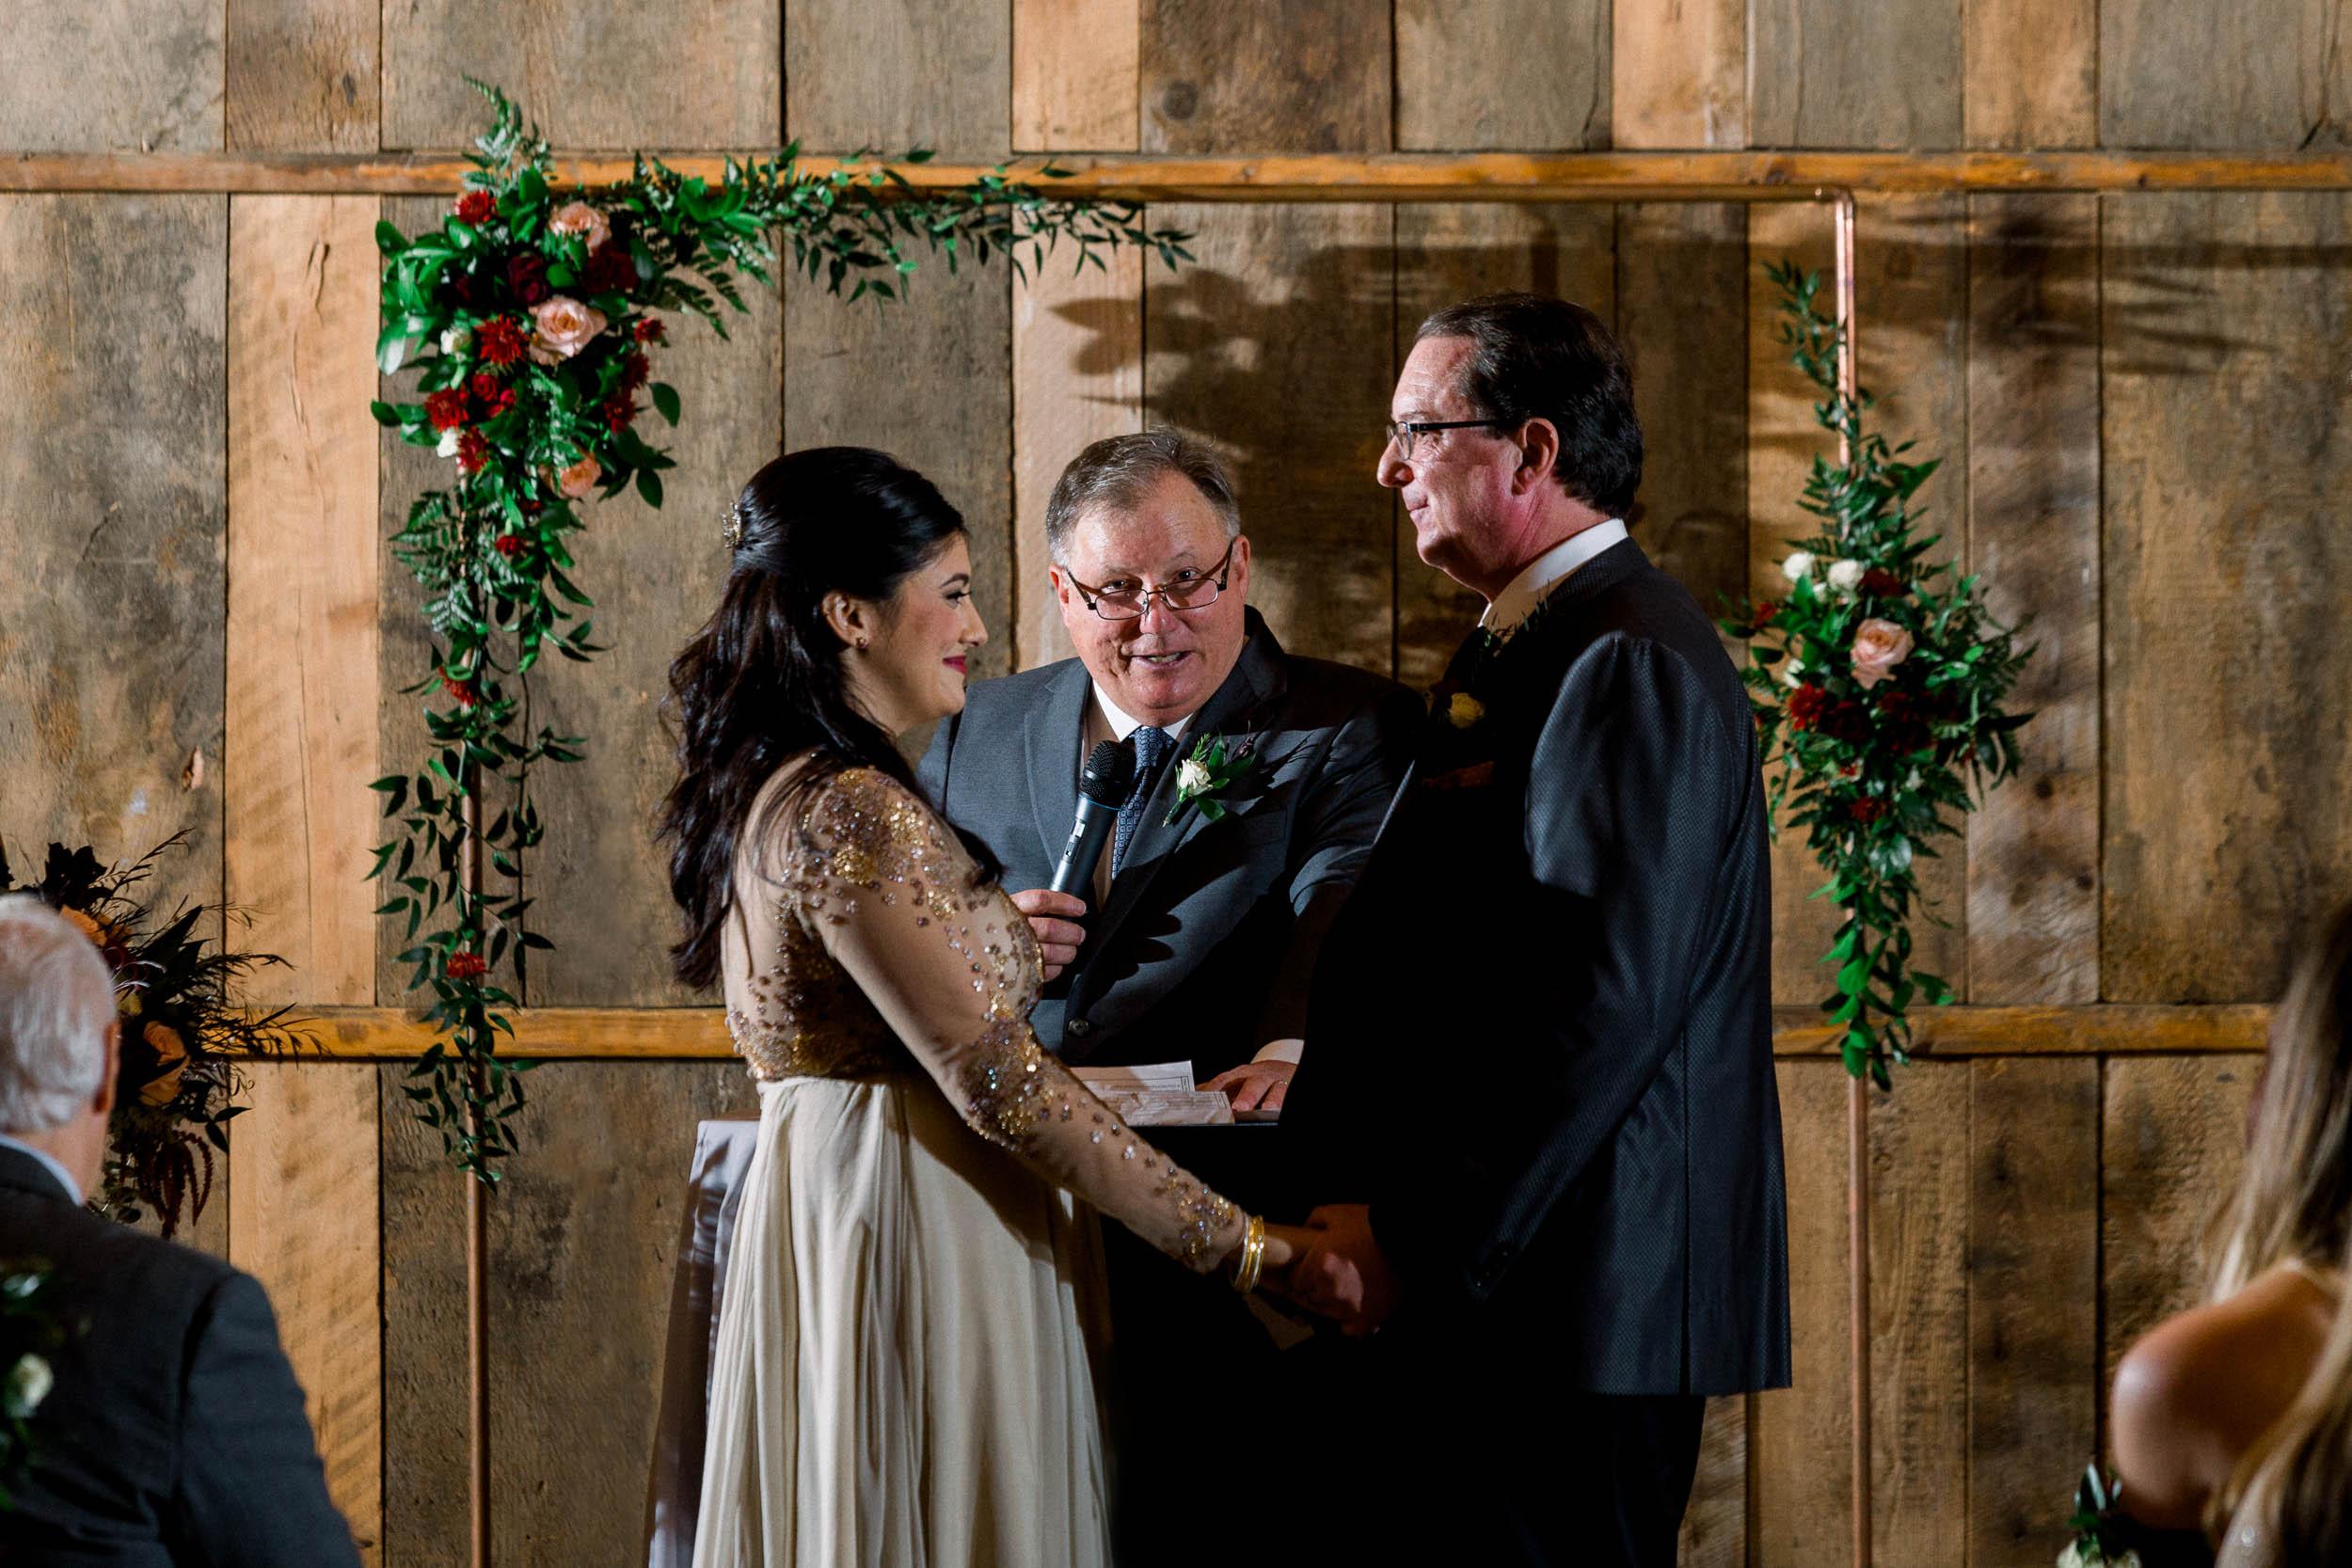 J+J Portland Maine Wedding_Buena Lane Photography_112718_SJ_33.jpg